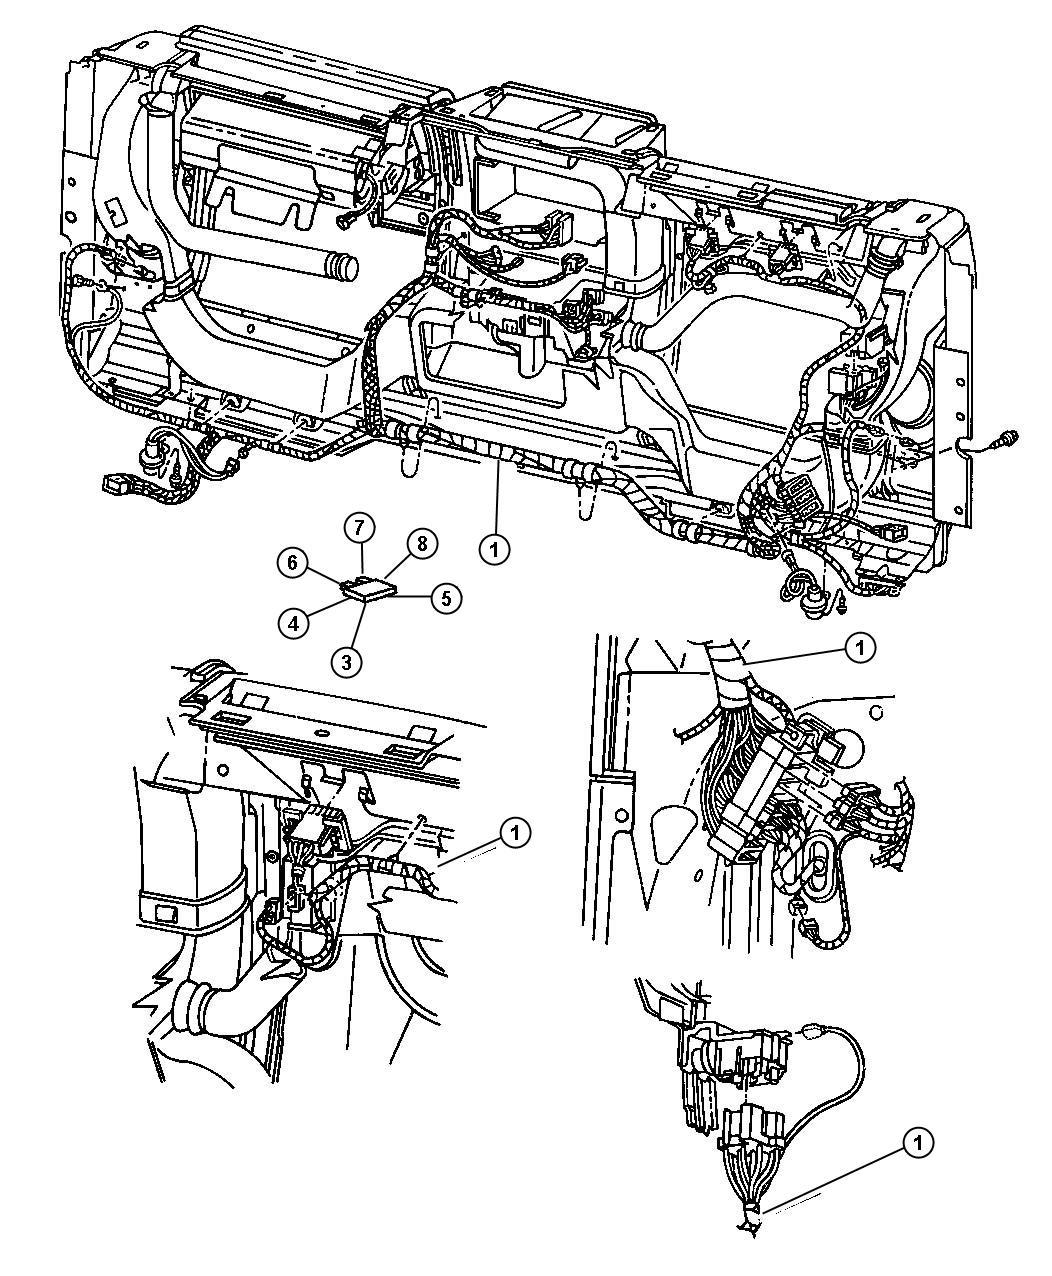 1998 jeep grand cherokee flasher  usa  canada  engine  export  equipment